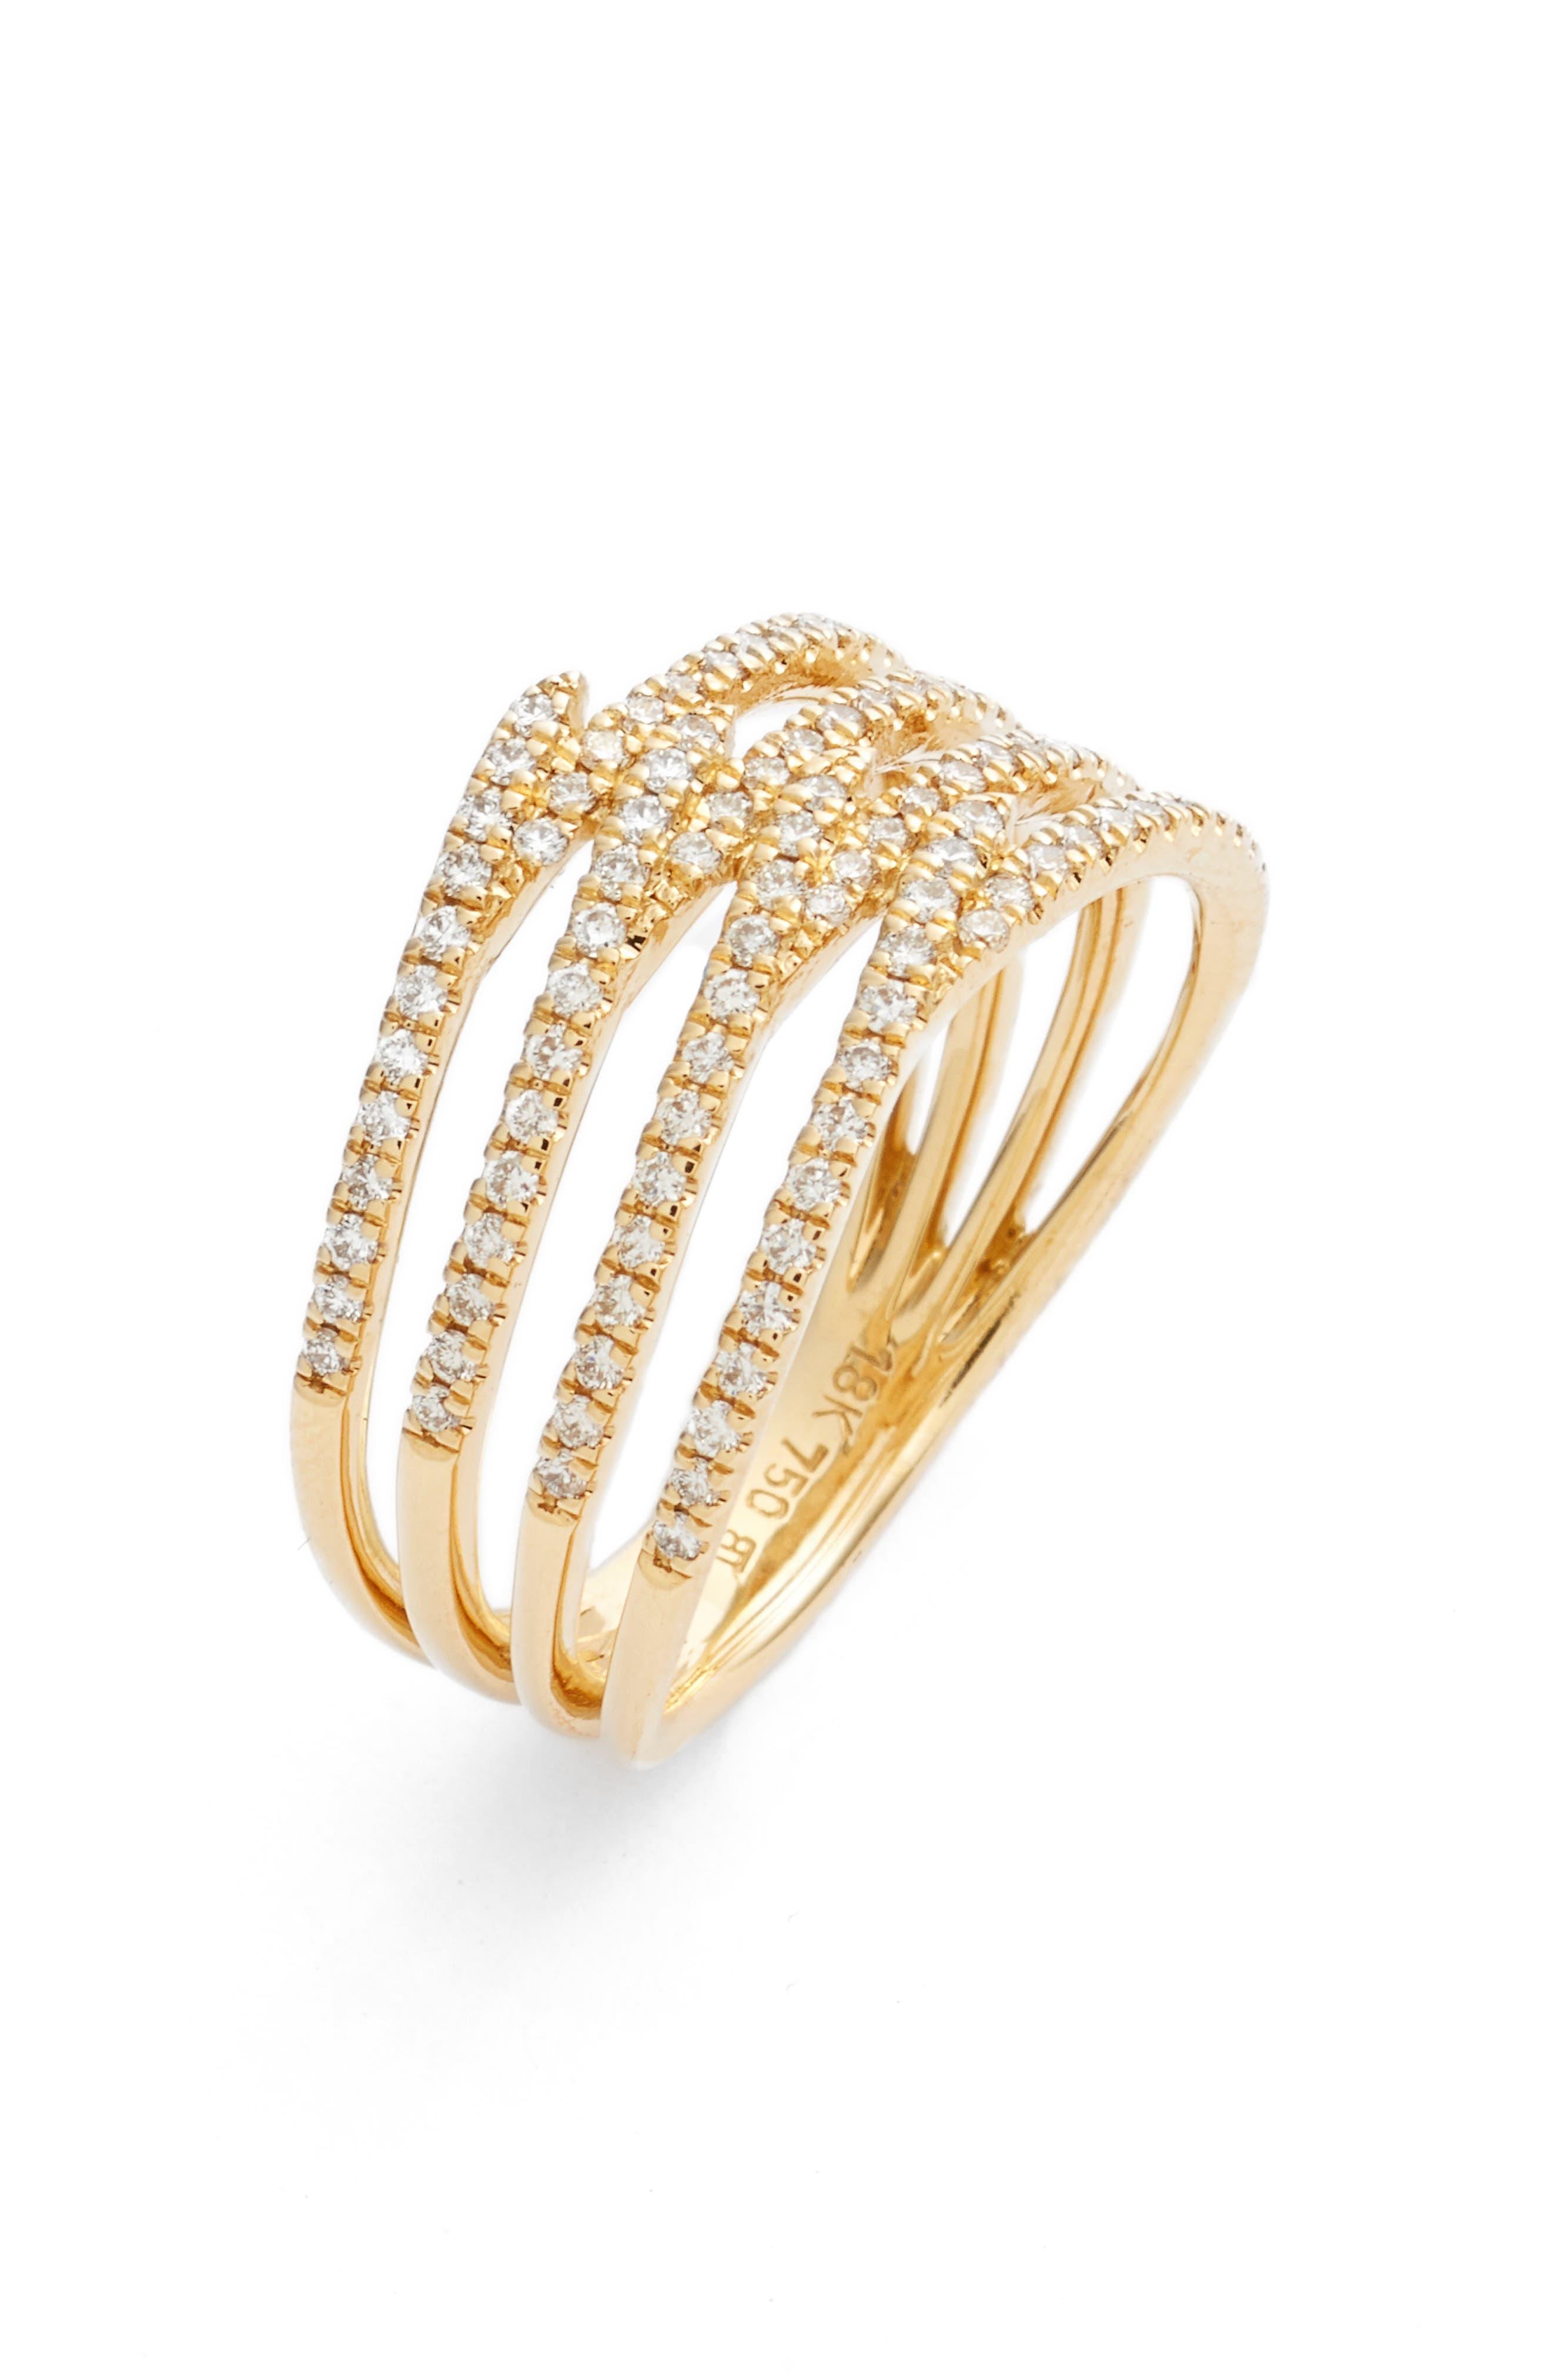 Kiera Four-Row Diamond Ring,                         Main,                         color, YELLOW GOLD